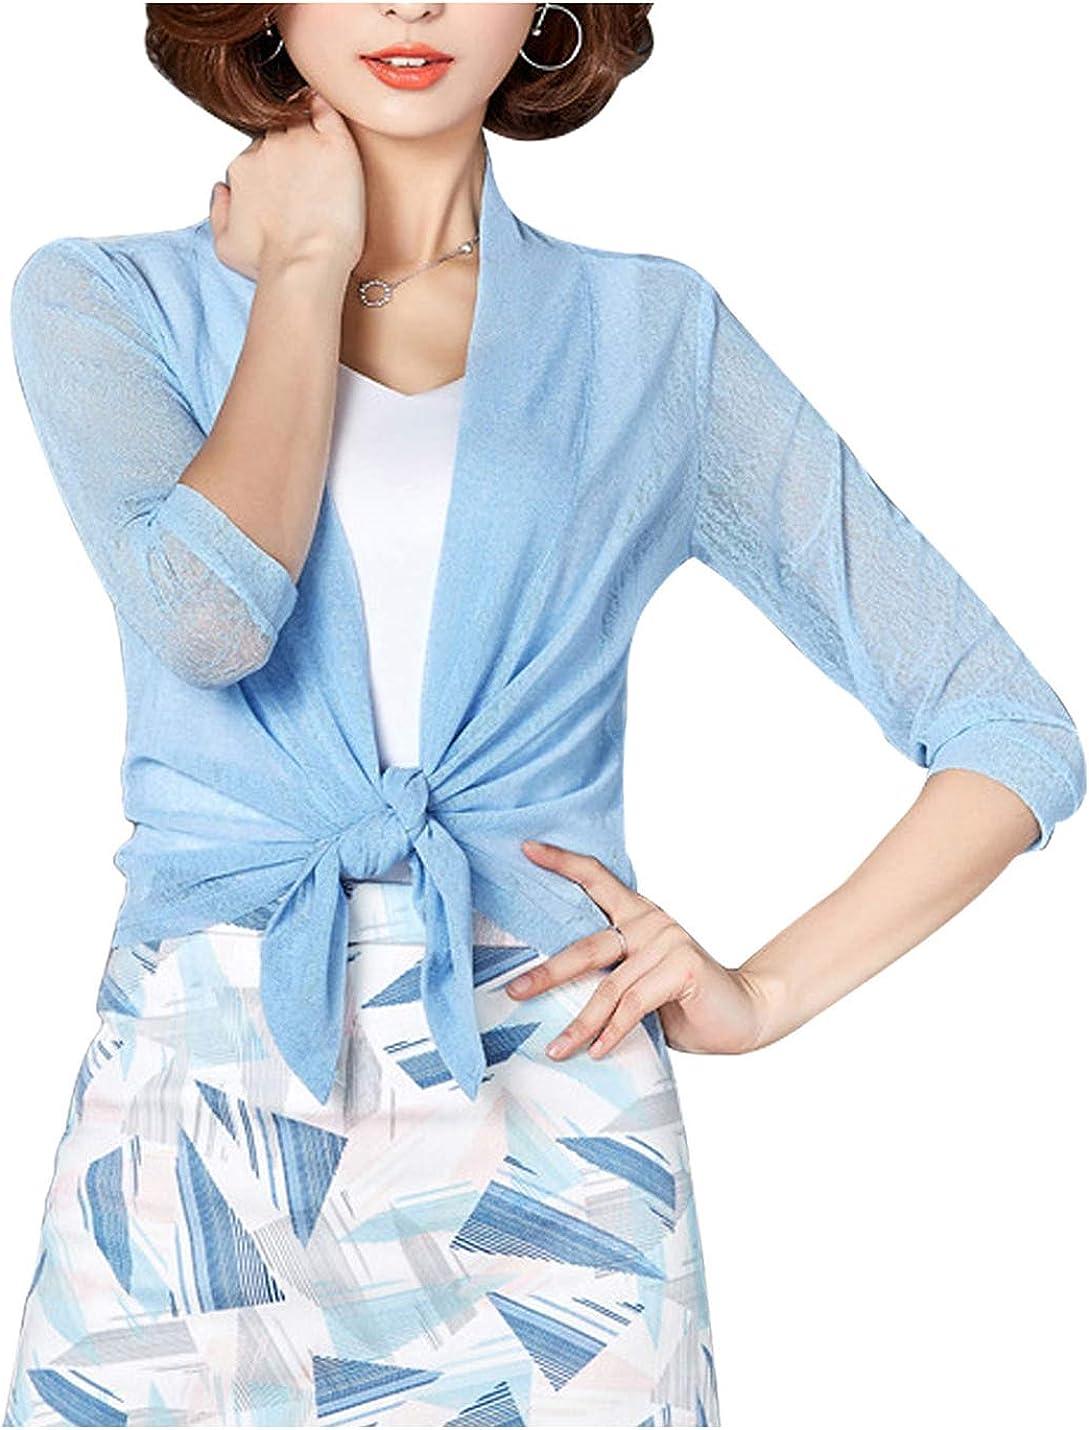 Omoone Women's Cropped Mesh Knit Tie Top Lightweight Sheer Shrug Bolero Cardigan